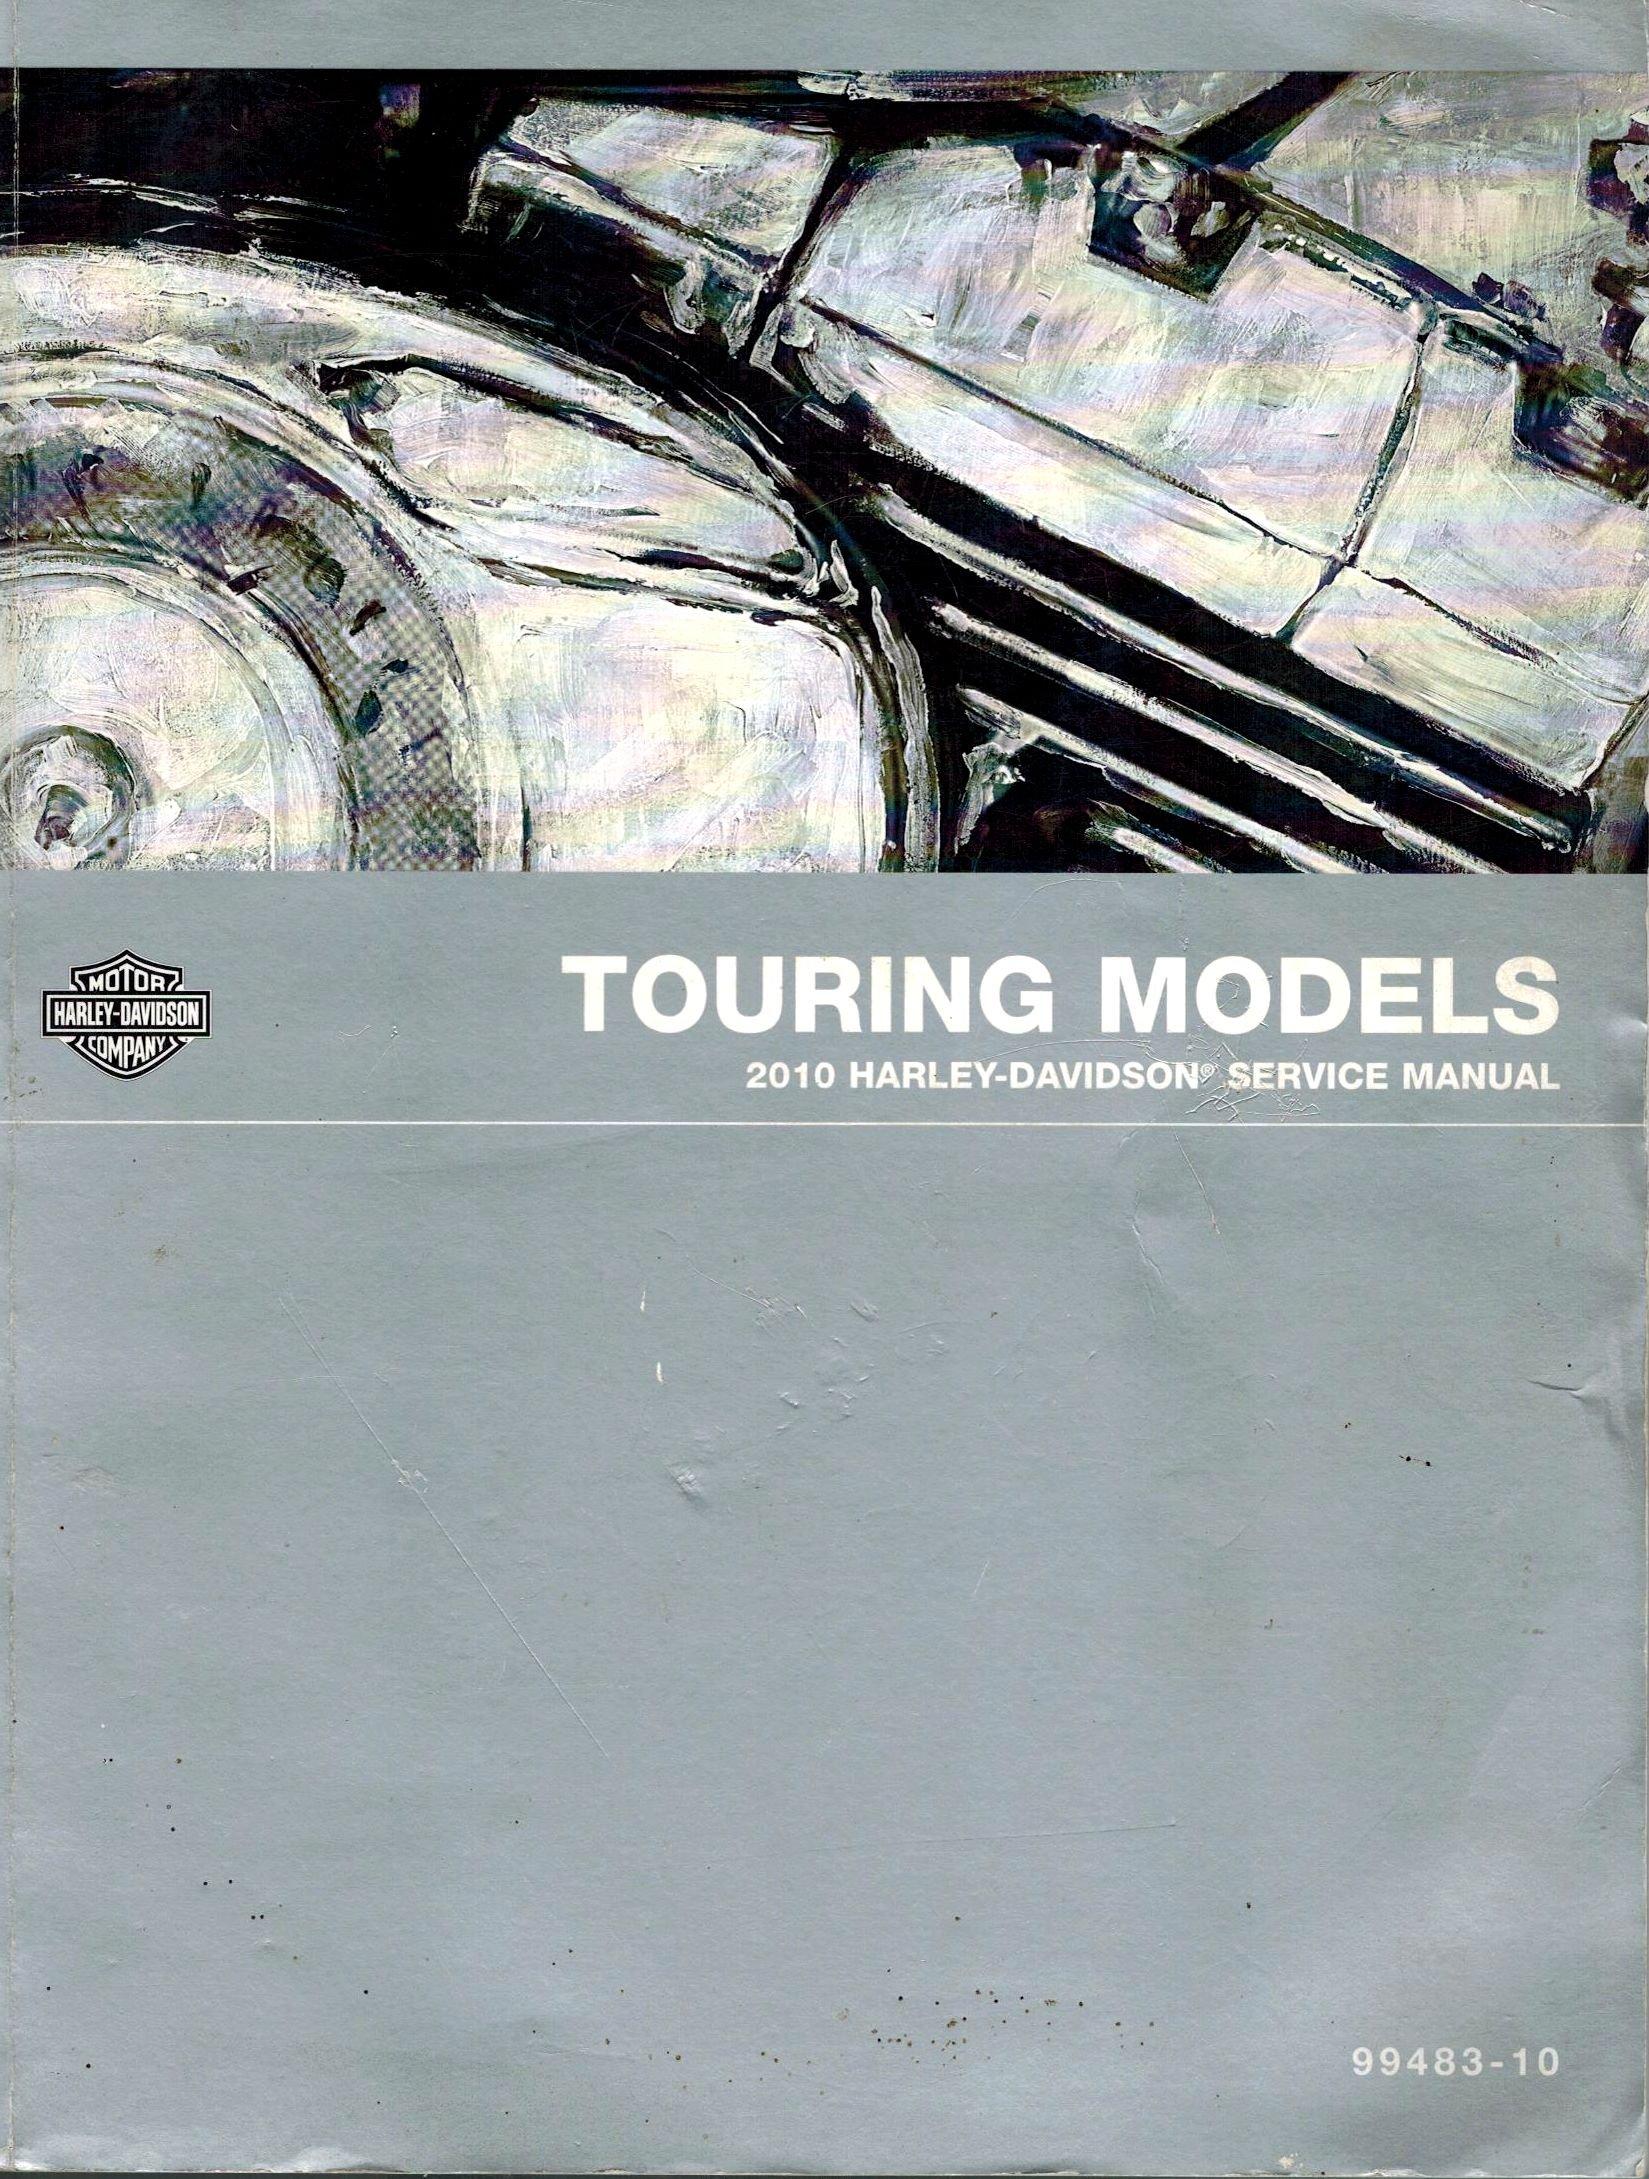 2010 Harley-davidson Touring Models Service Manual 99483-10: Harley-Davidson  Motor Company: Amazon.com: Books